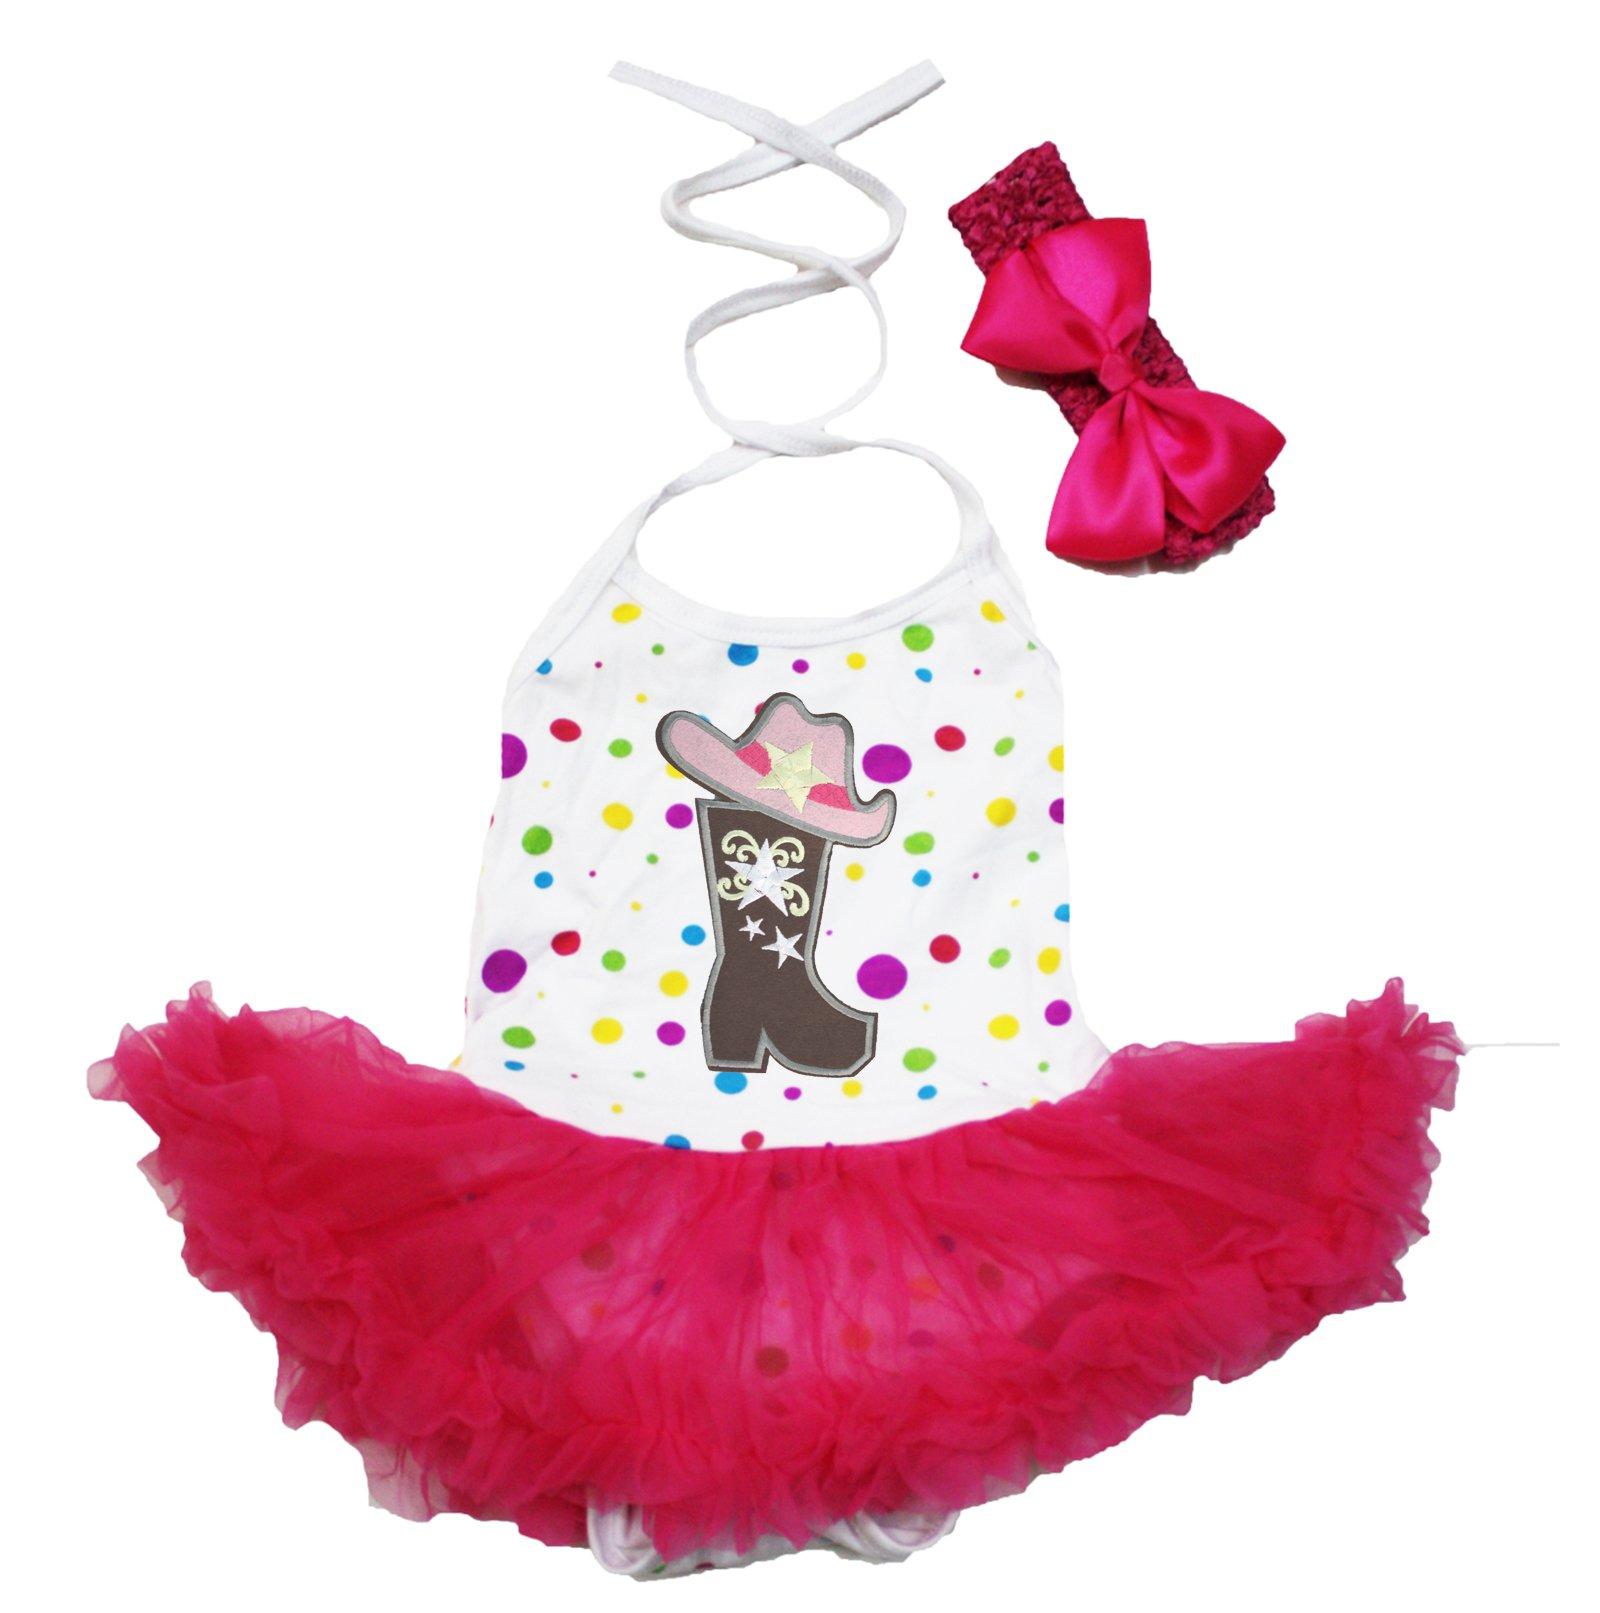 Cowgirl Dress Hat Boot White Halter Neck Bodysuit Hot Pink Tutu Clothing Nb-24m (6-12 Months)